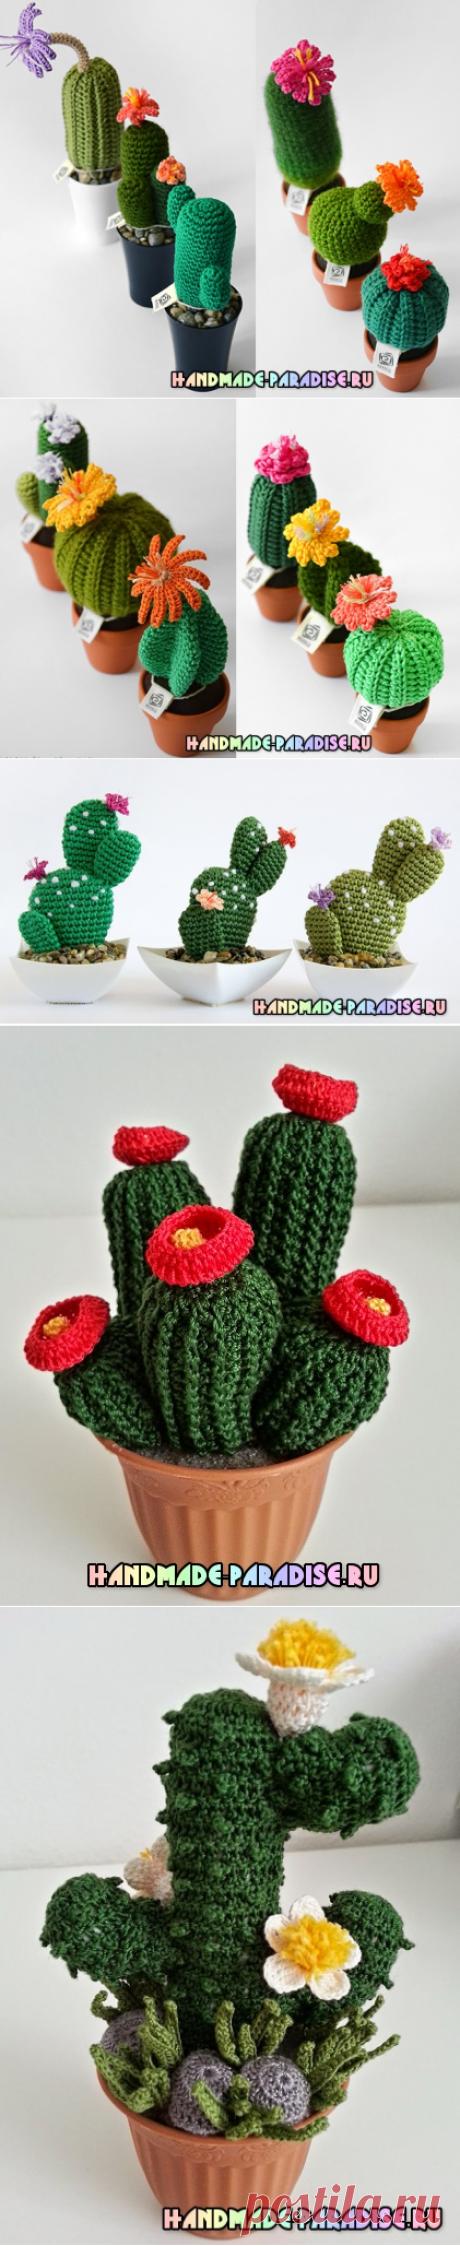 Цветущий вязаный кактус. Схемы - Handmade-Paradise